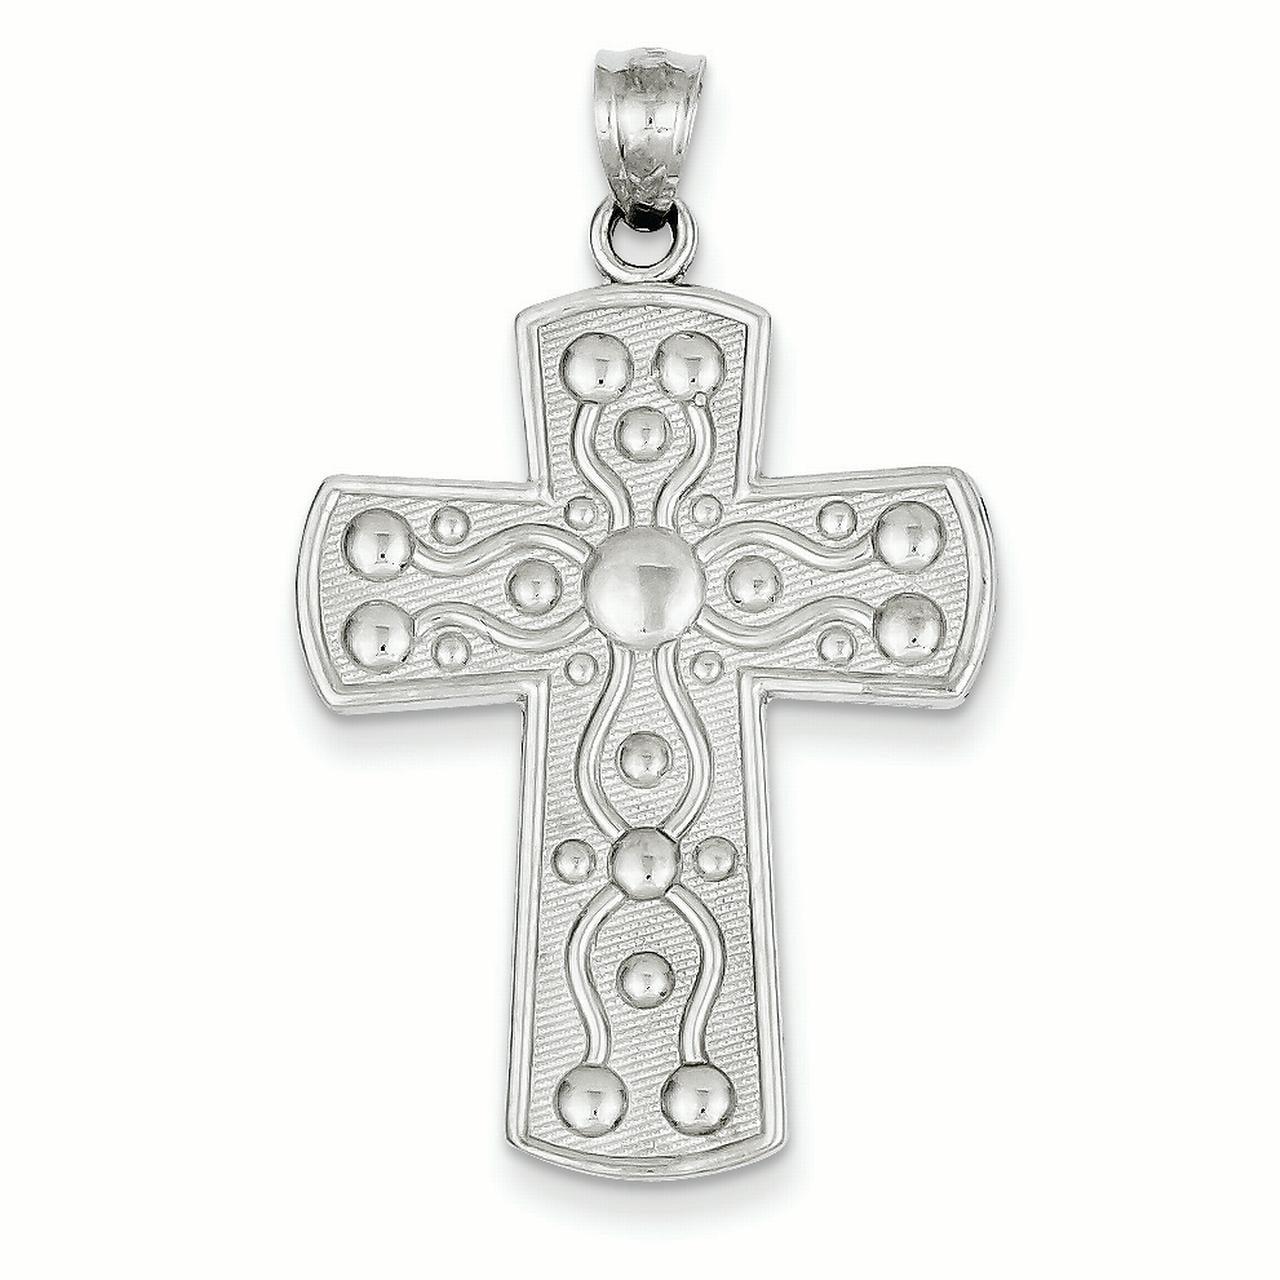 14k White Gold Cross w/Serenity Prayer (24x37mm) Pendant ...